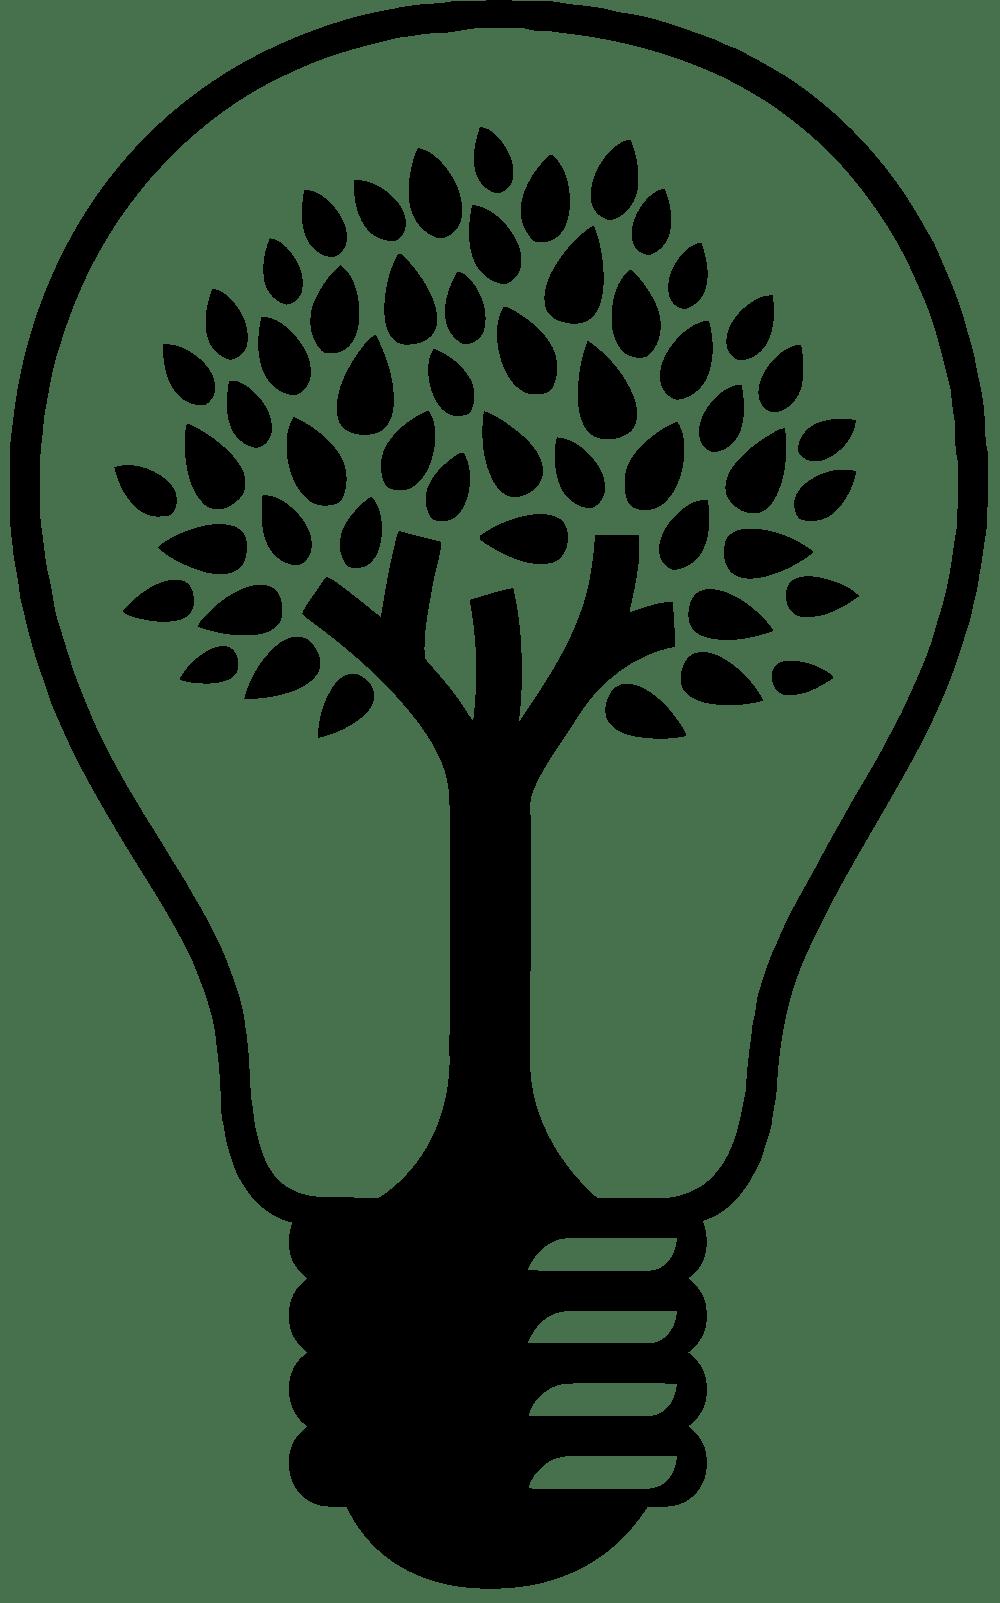 michaeldorner/DecisionTrees Seminar work